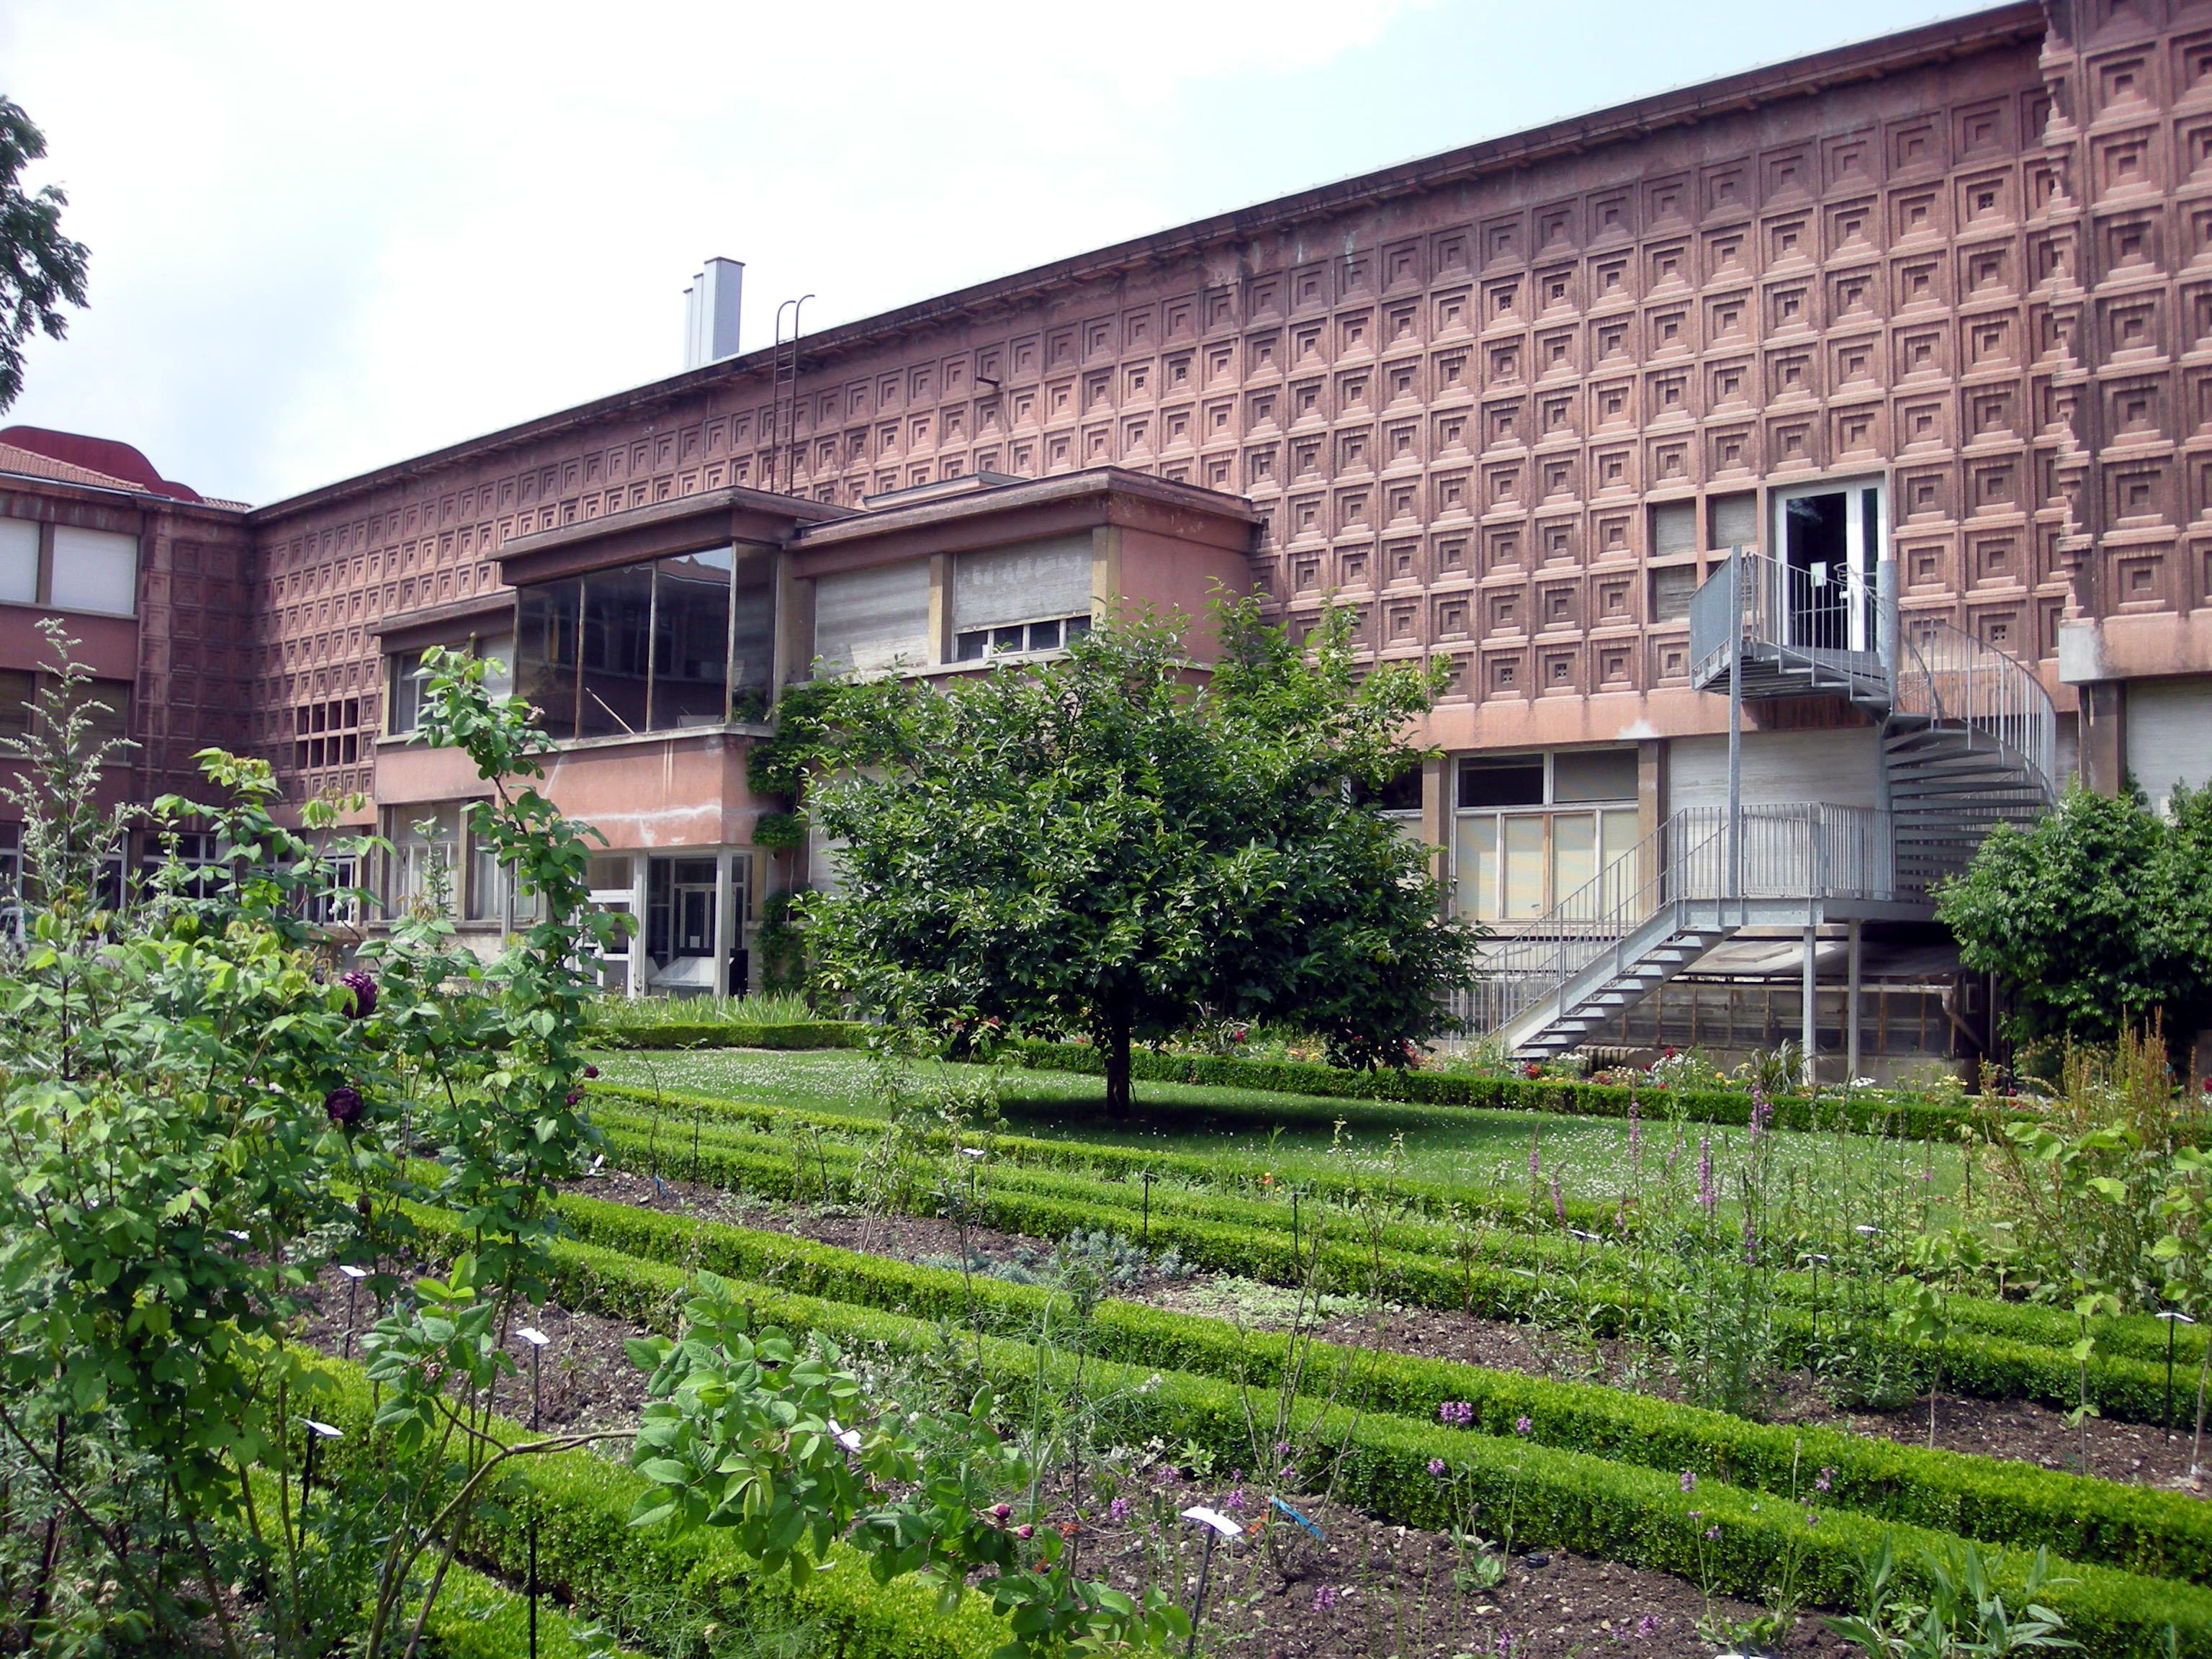 Jardin dominique alexandre godron wikiwand for Alexandre jardin wikipedia